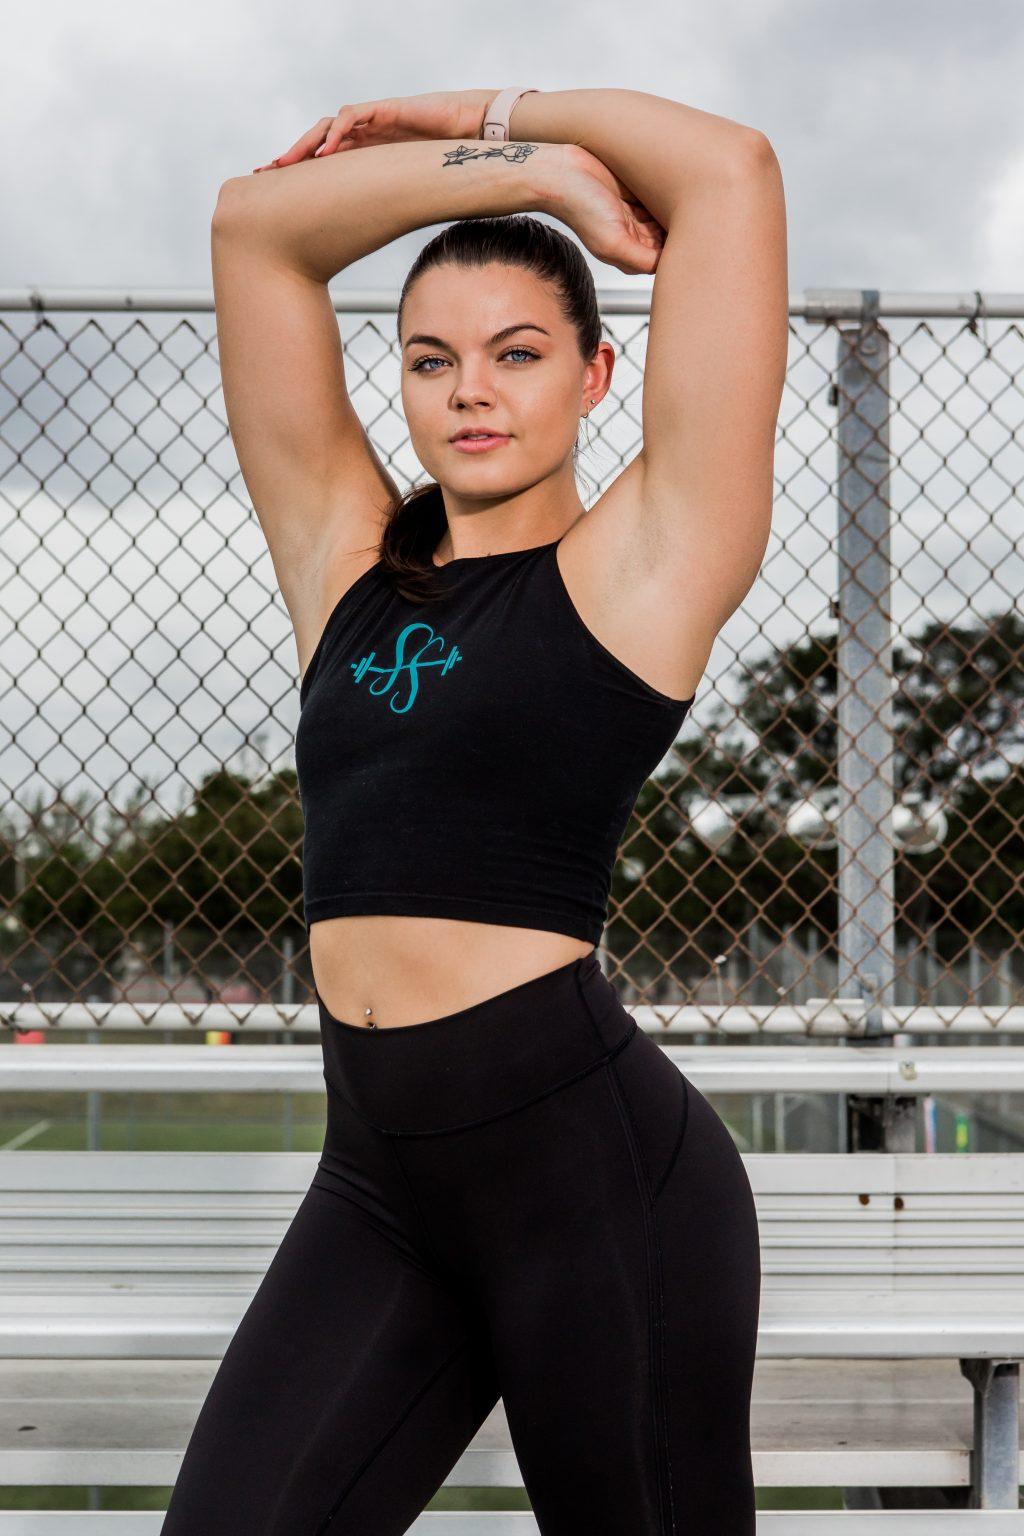 Personal Trainer Miami, Florida - Sierra C